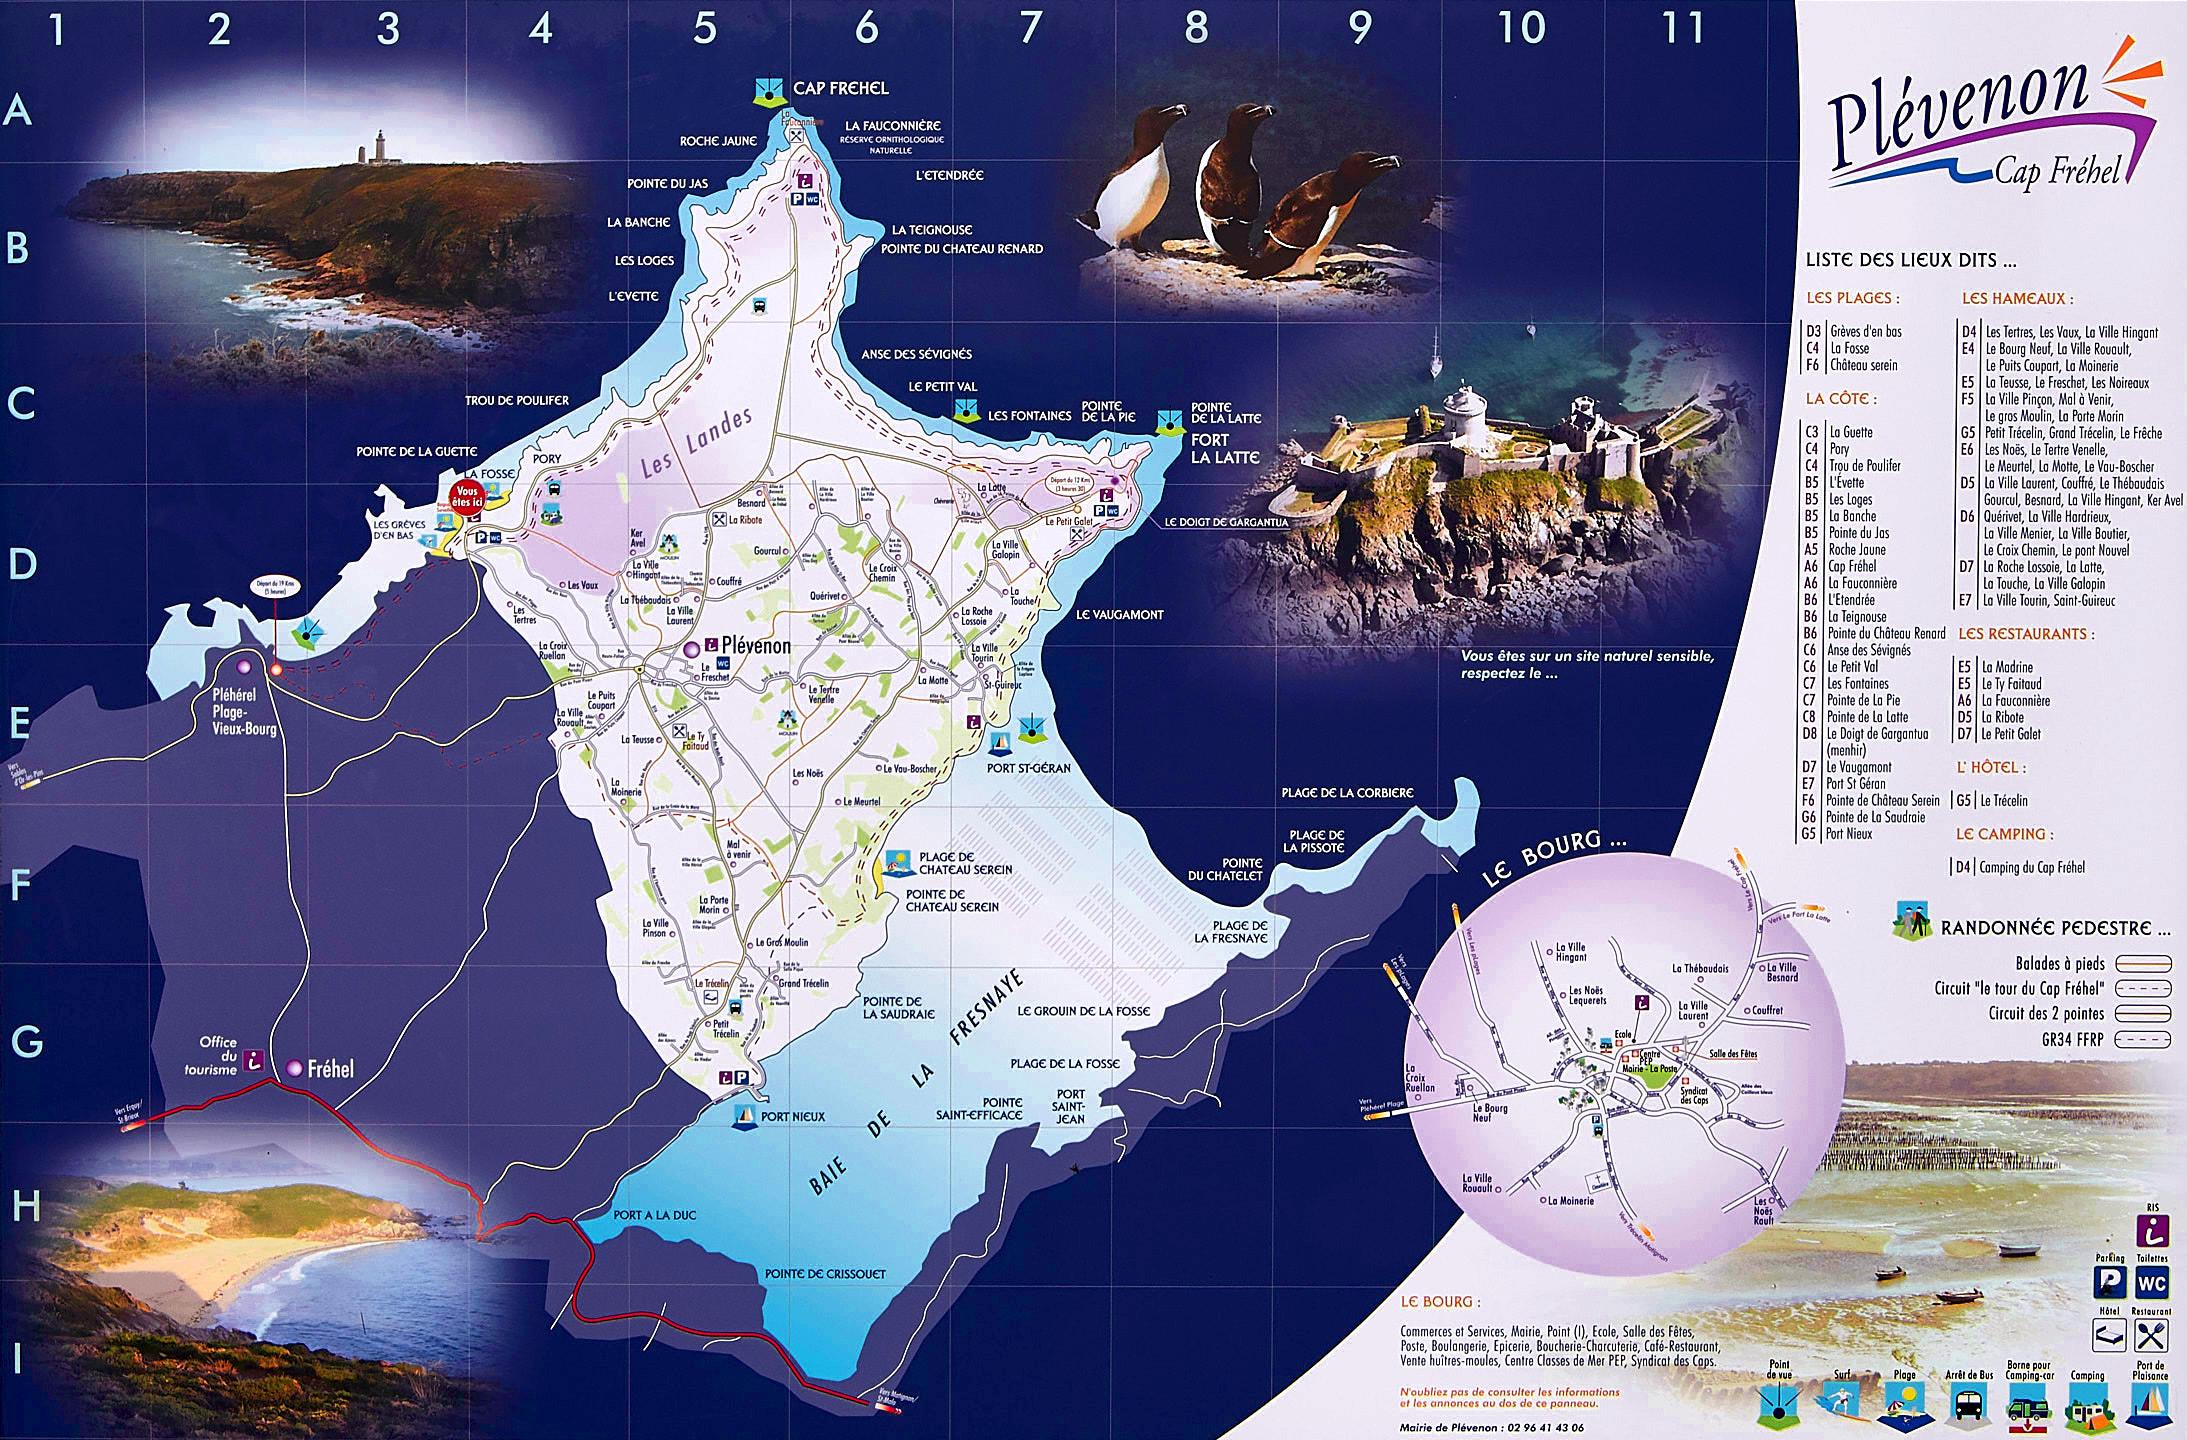 Carte de la presqu'île du cap Fréhel